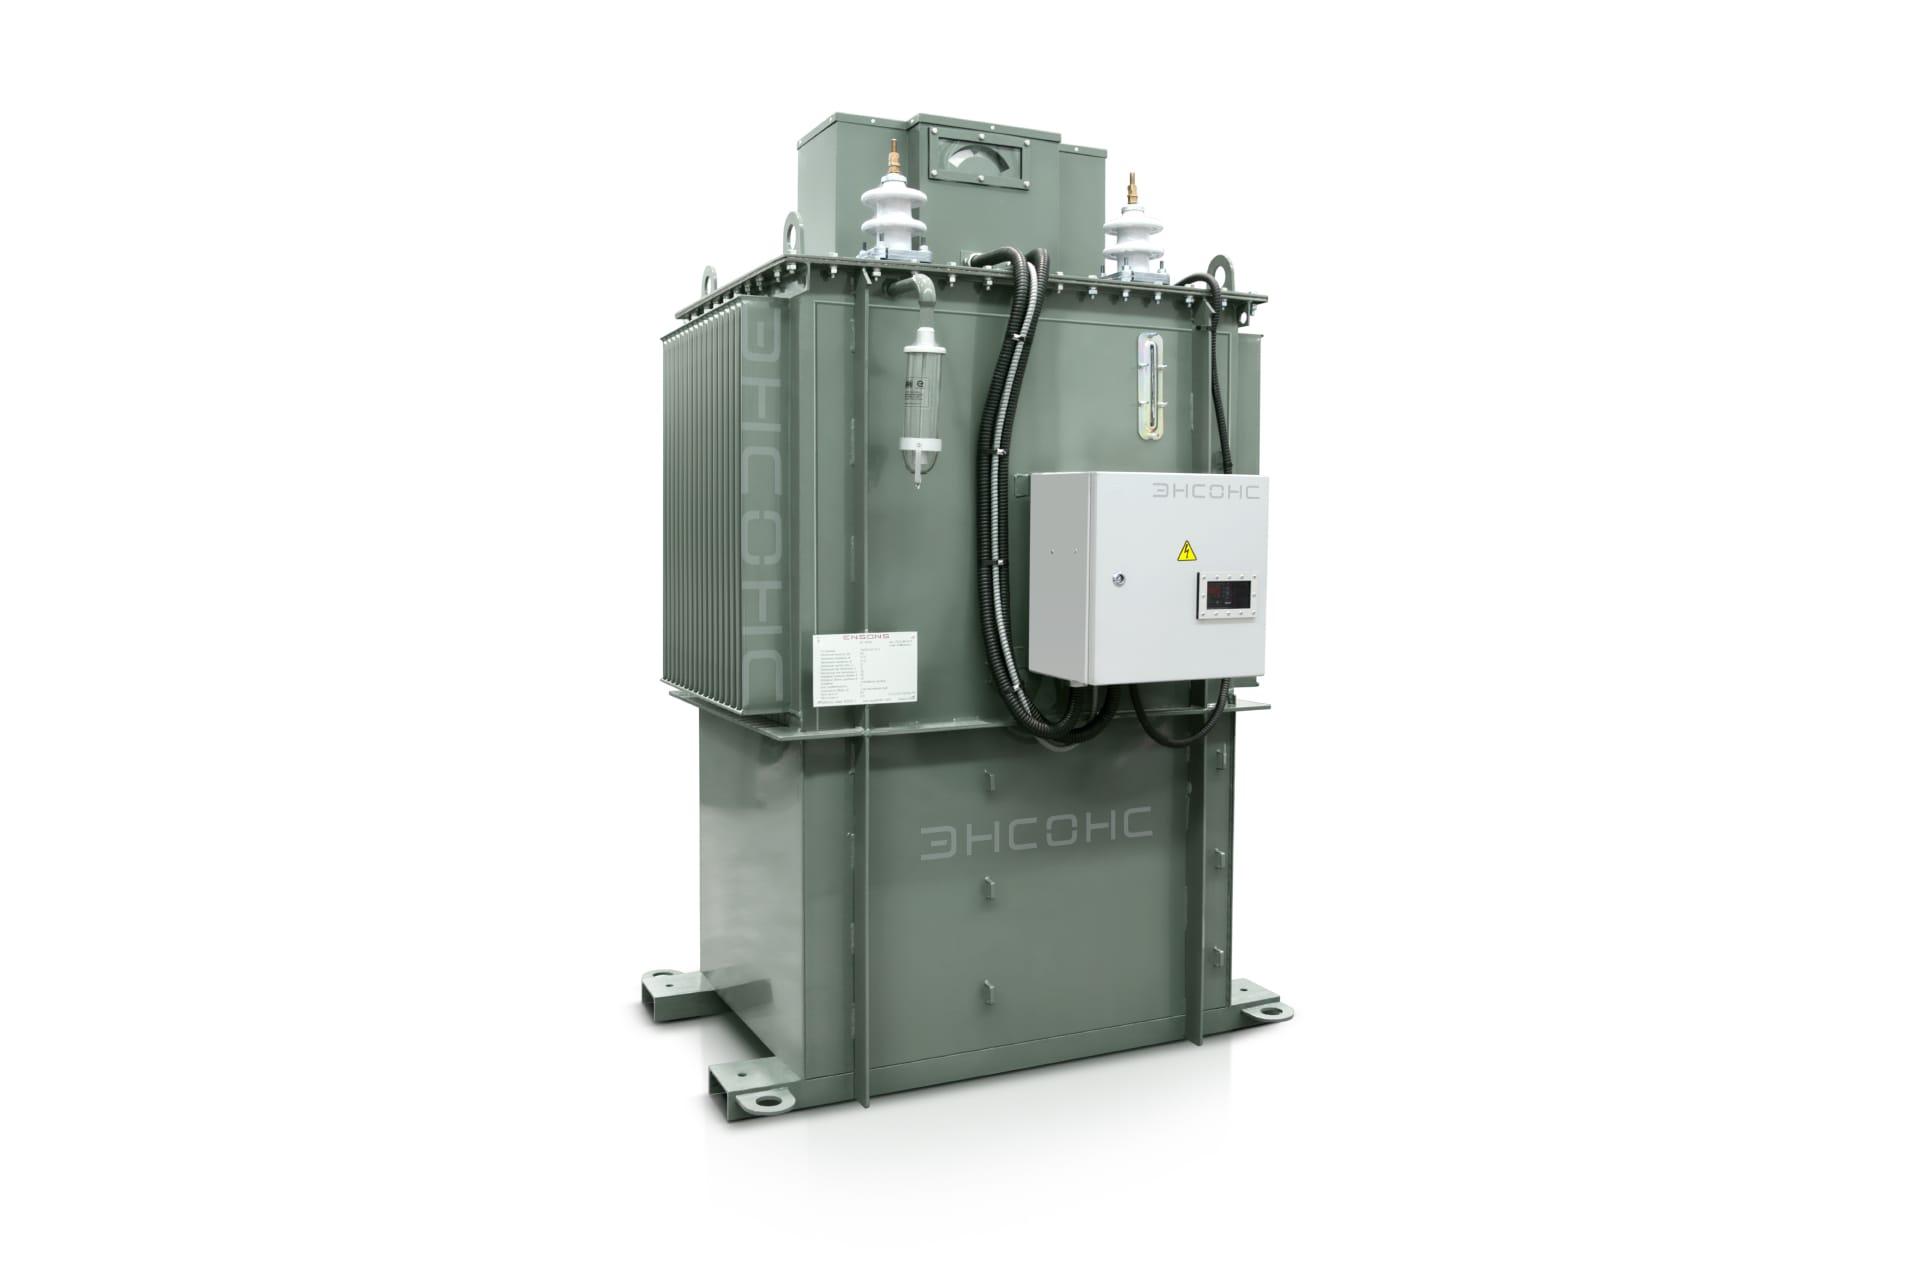 Ensons - Общий вид дугогасящего реактора РЗДПОМ 635 кВА